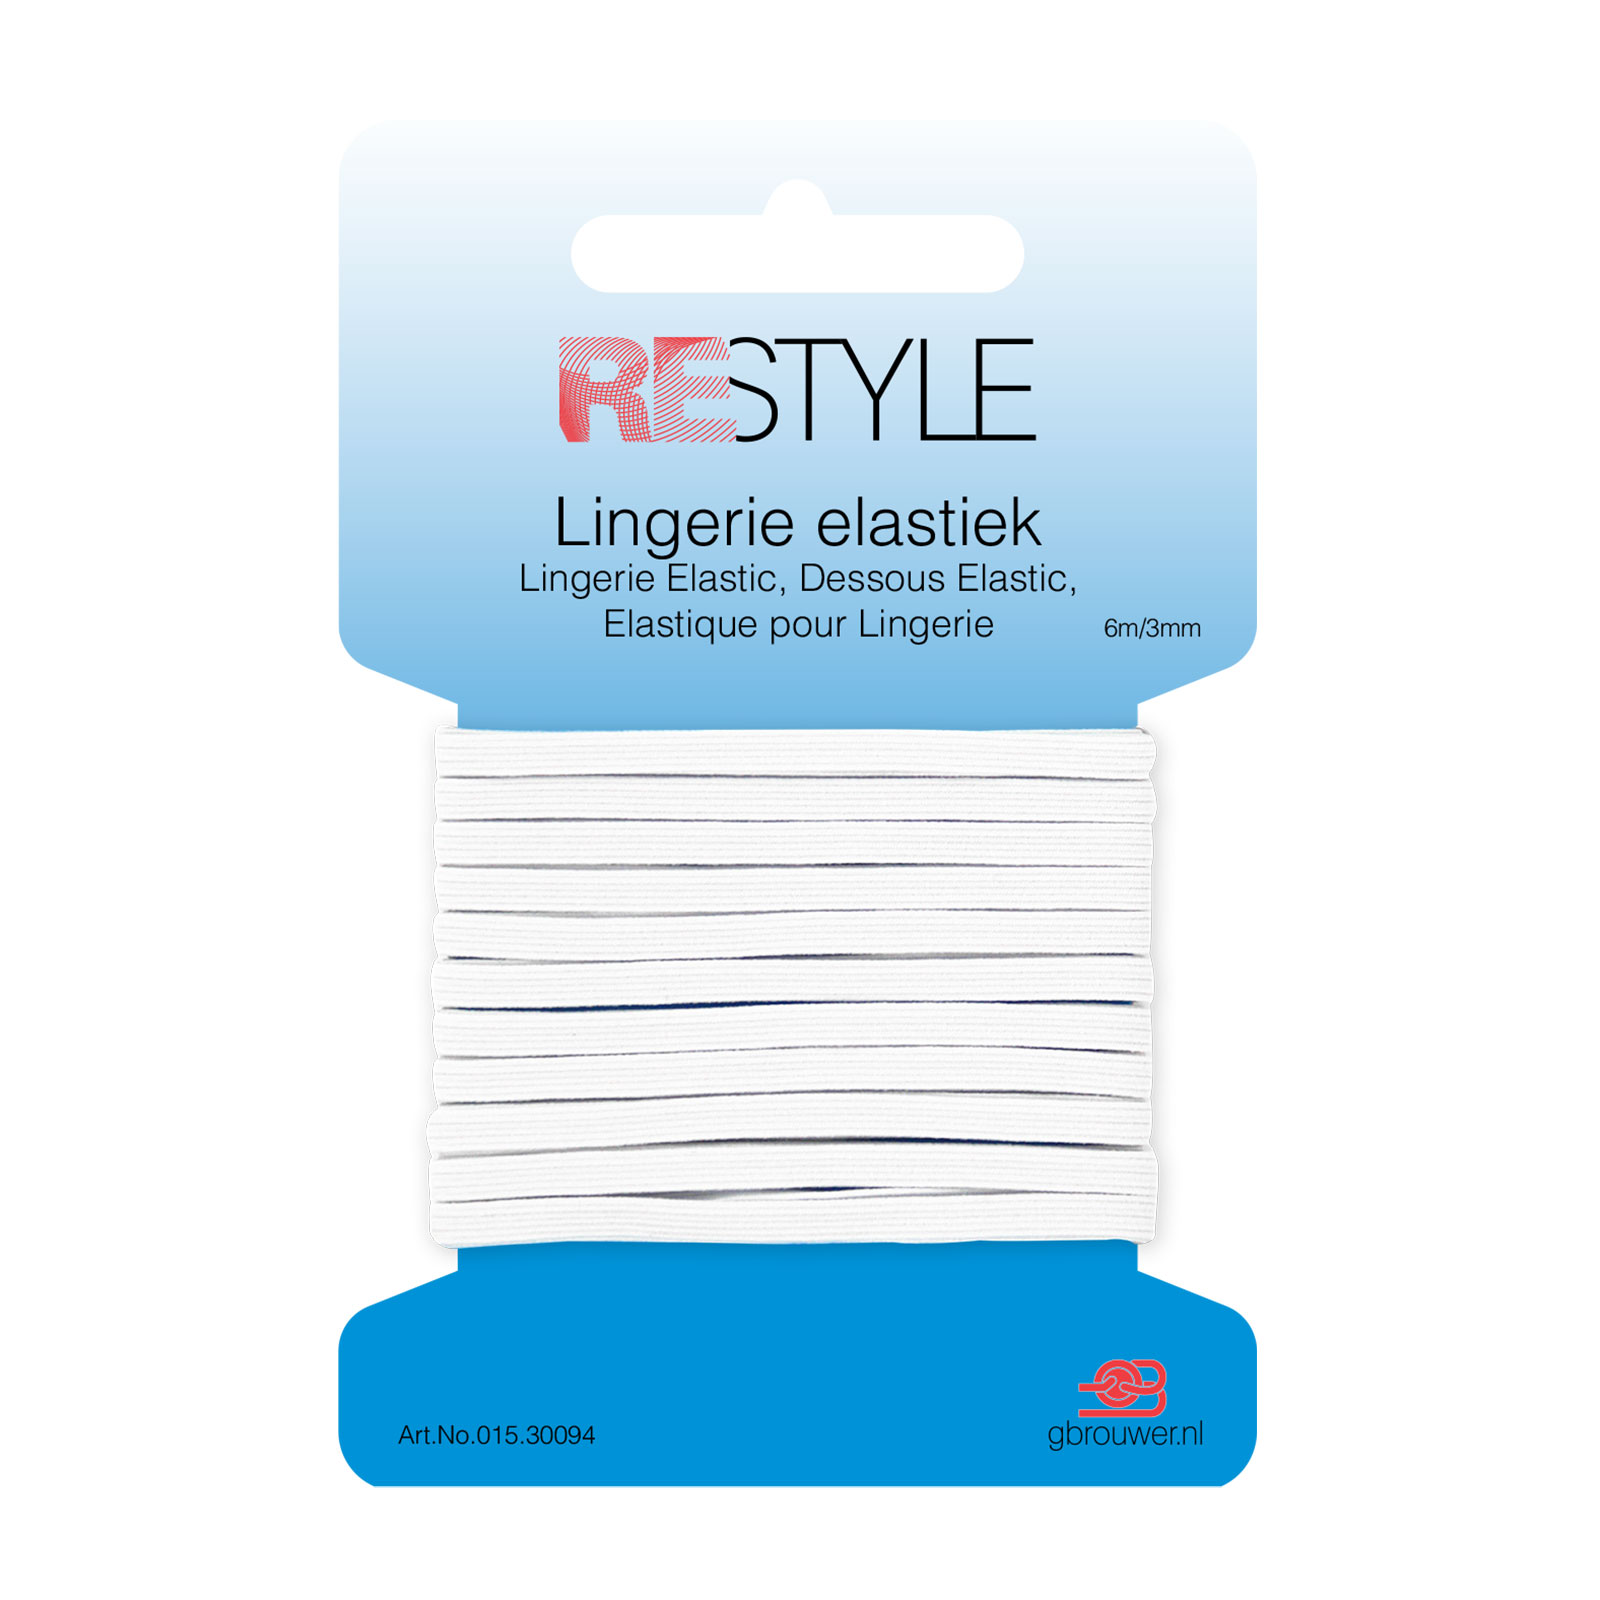 REStyle Lingerie Elastiek 3mm 6m Wit-009